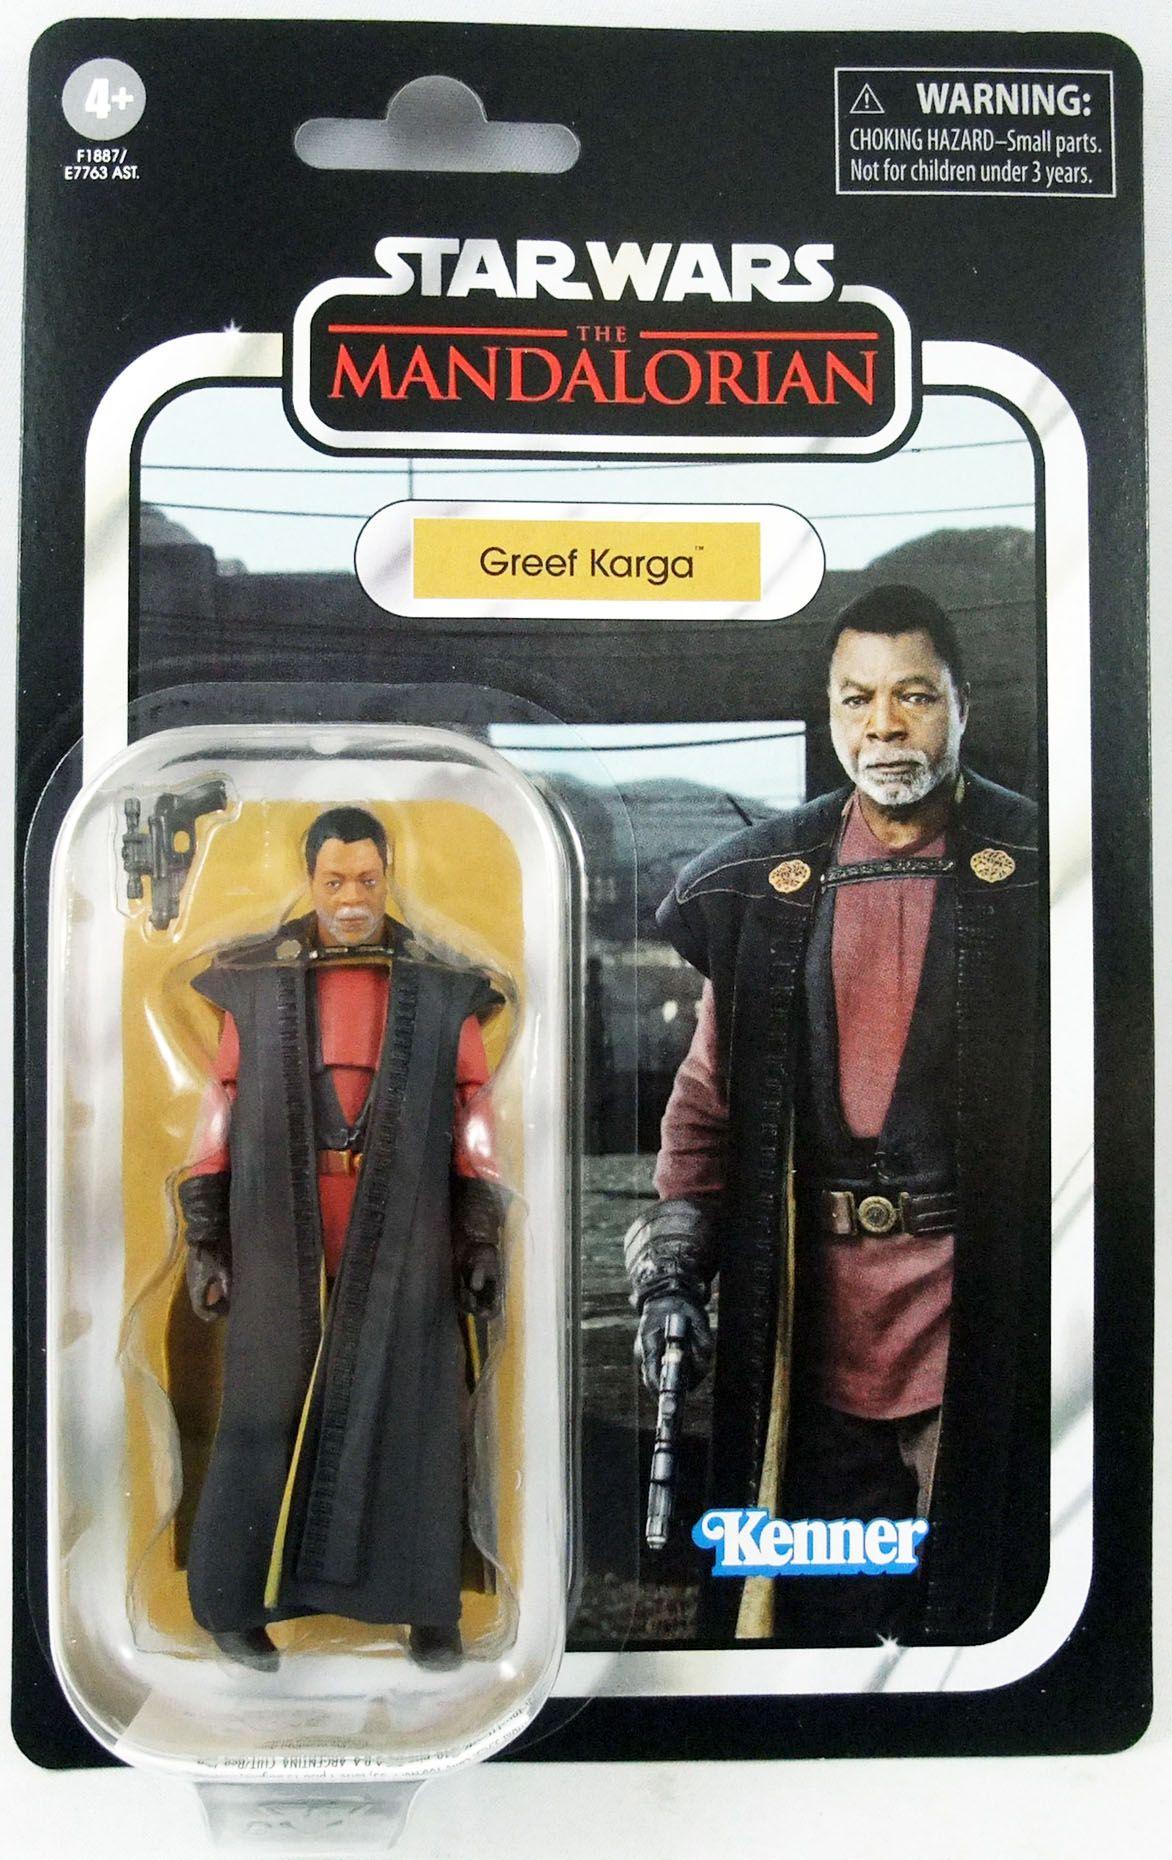 Star Wars (The Vintage Collection) - Hasbro - Greef Karga - The Mandalorian